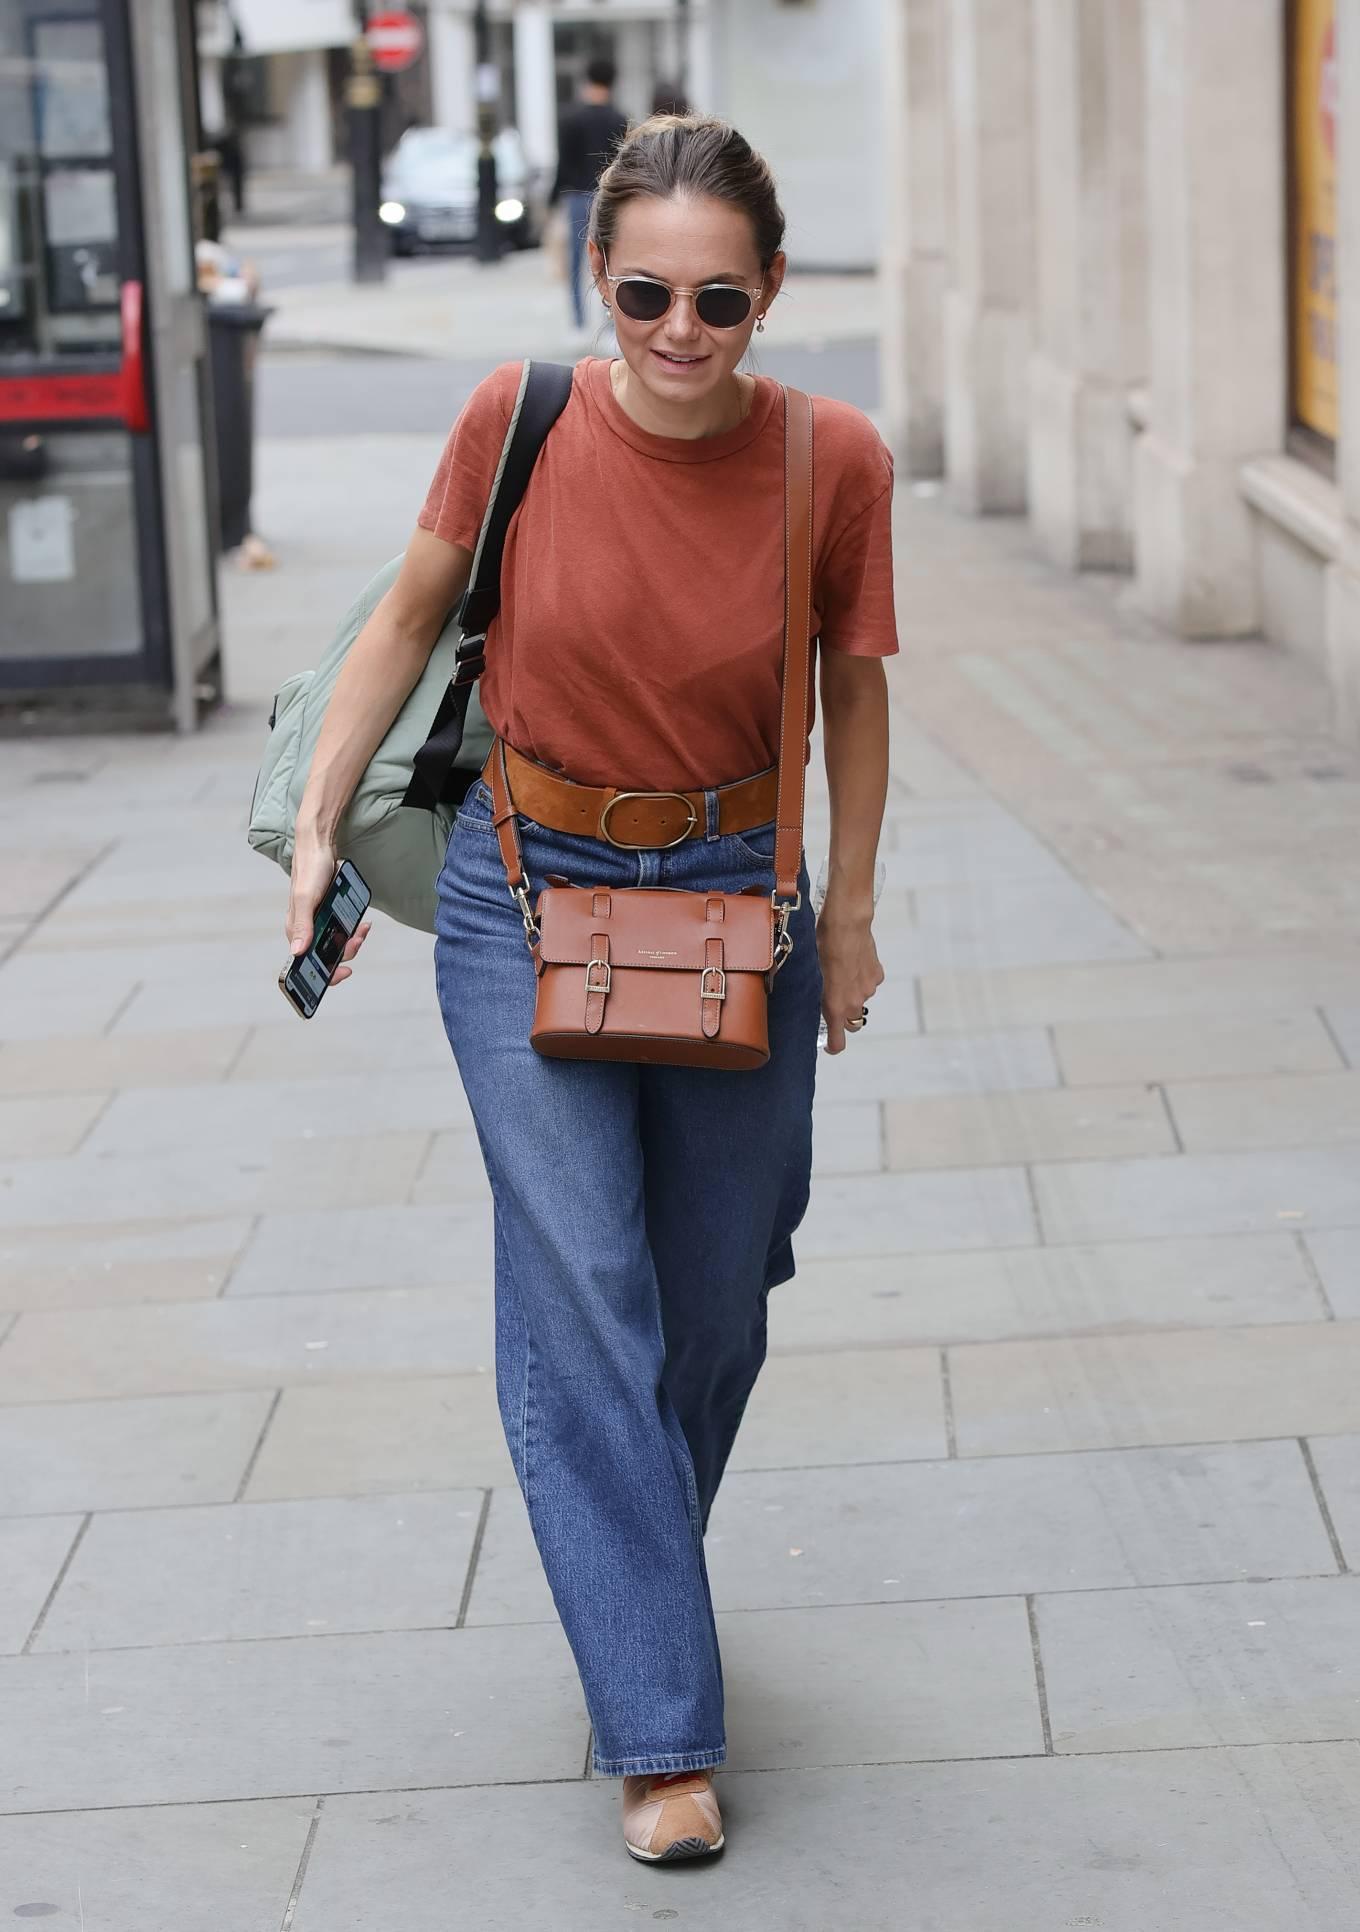 Kara Tointon 2021 : Kara Tointon – In flared denim pants stepping out in London-10